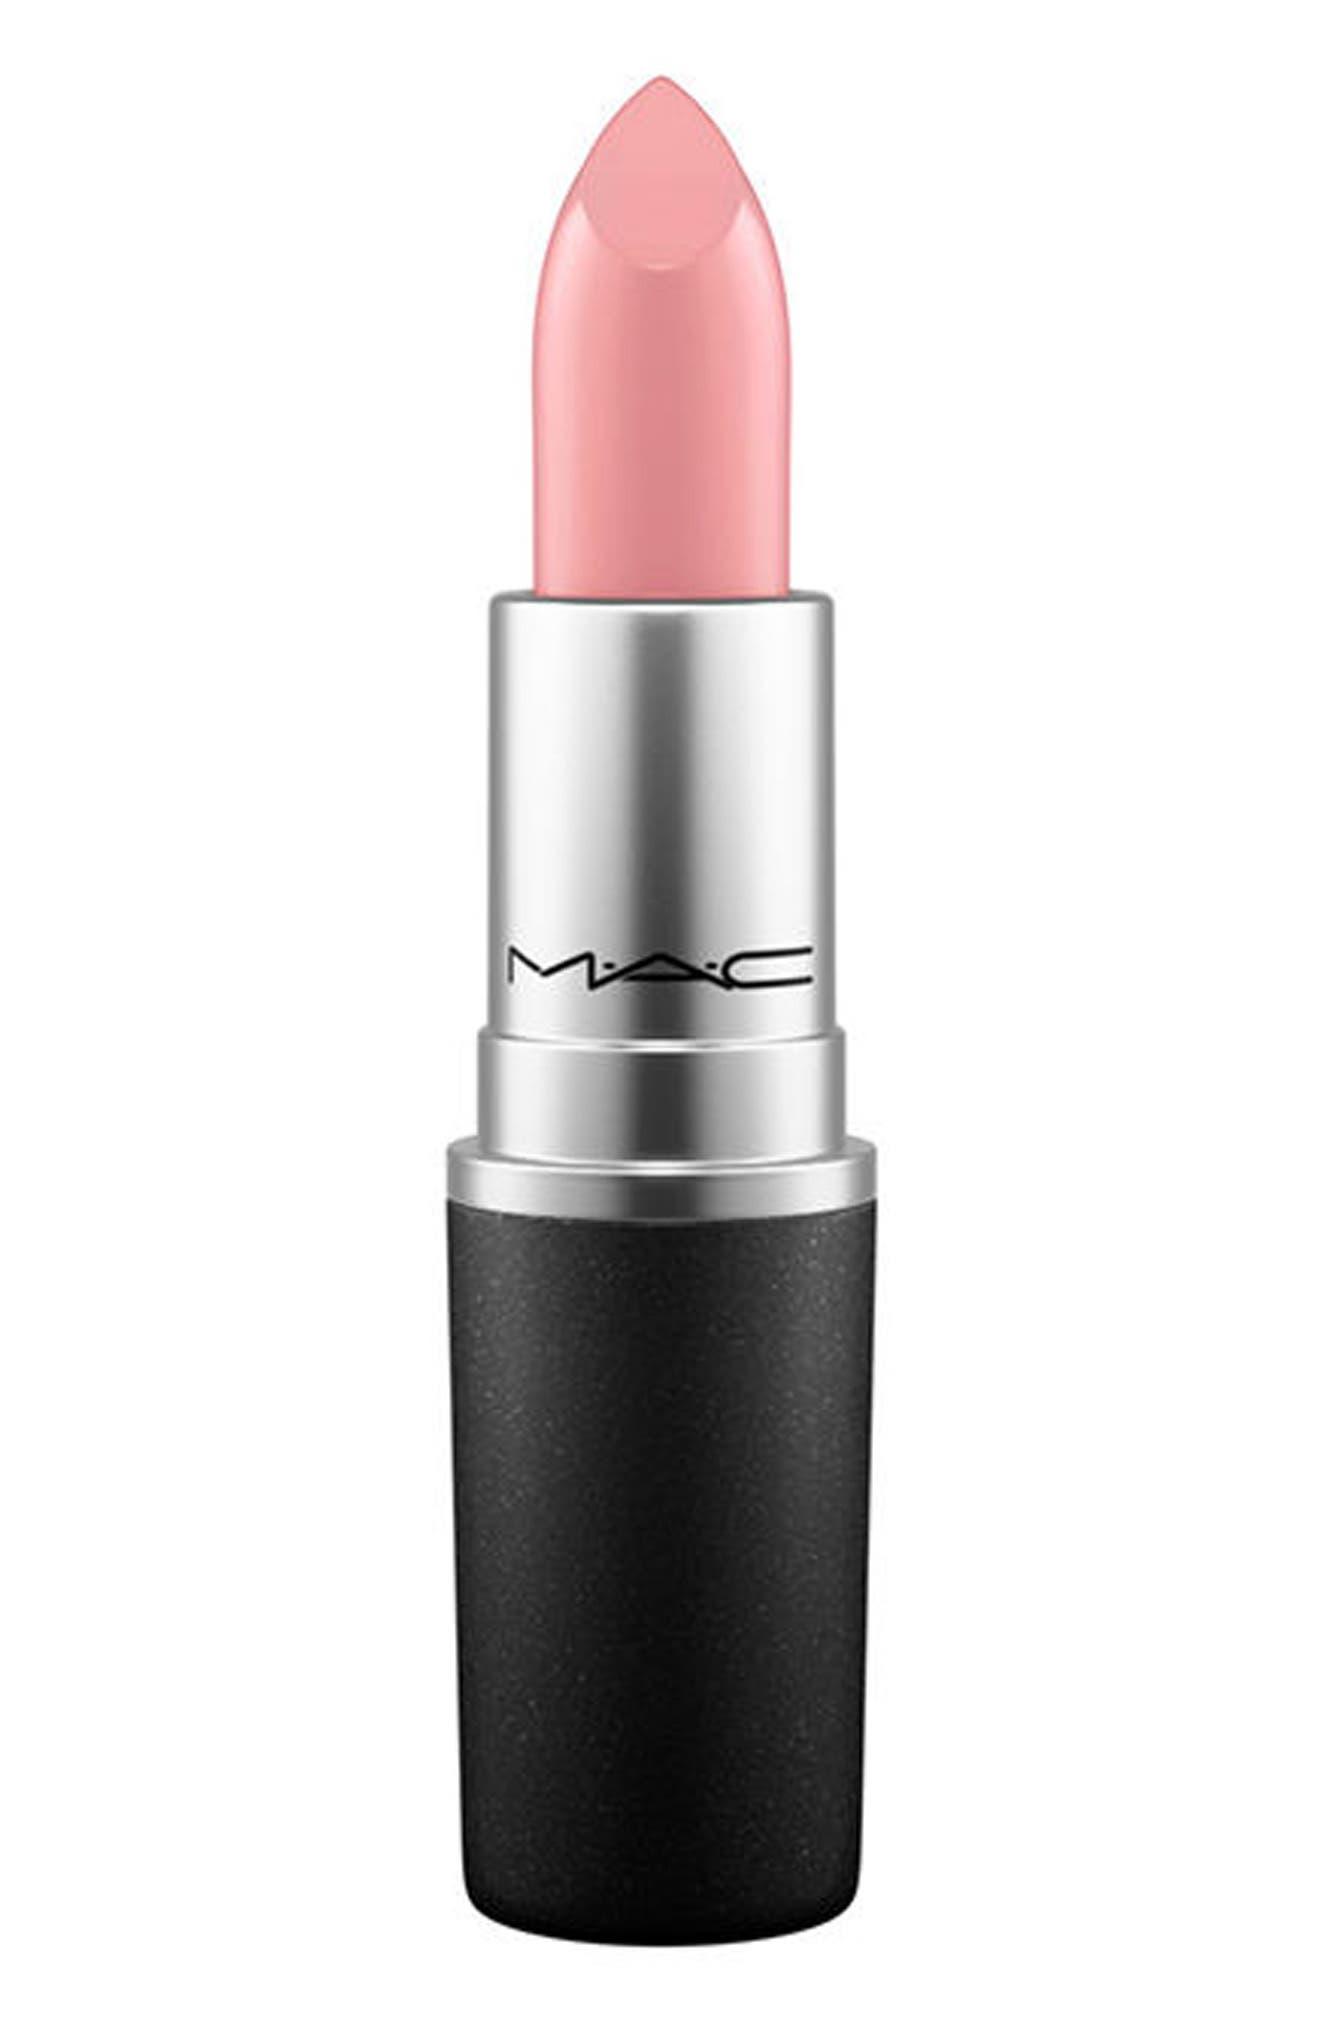 MAC Pink Lipstick, Main, color, CREME CUP (C)